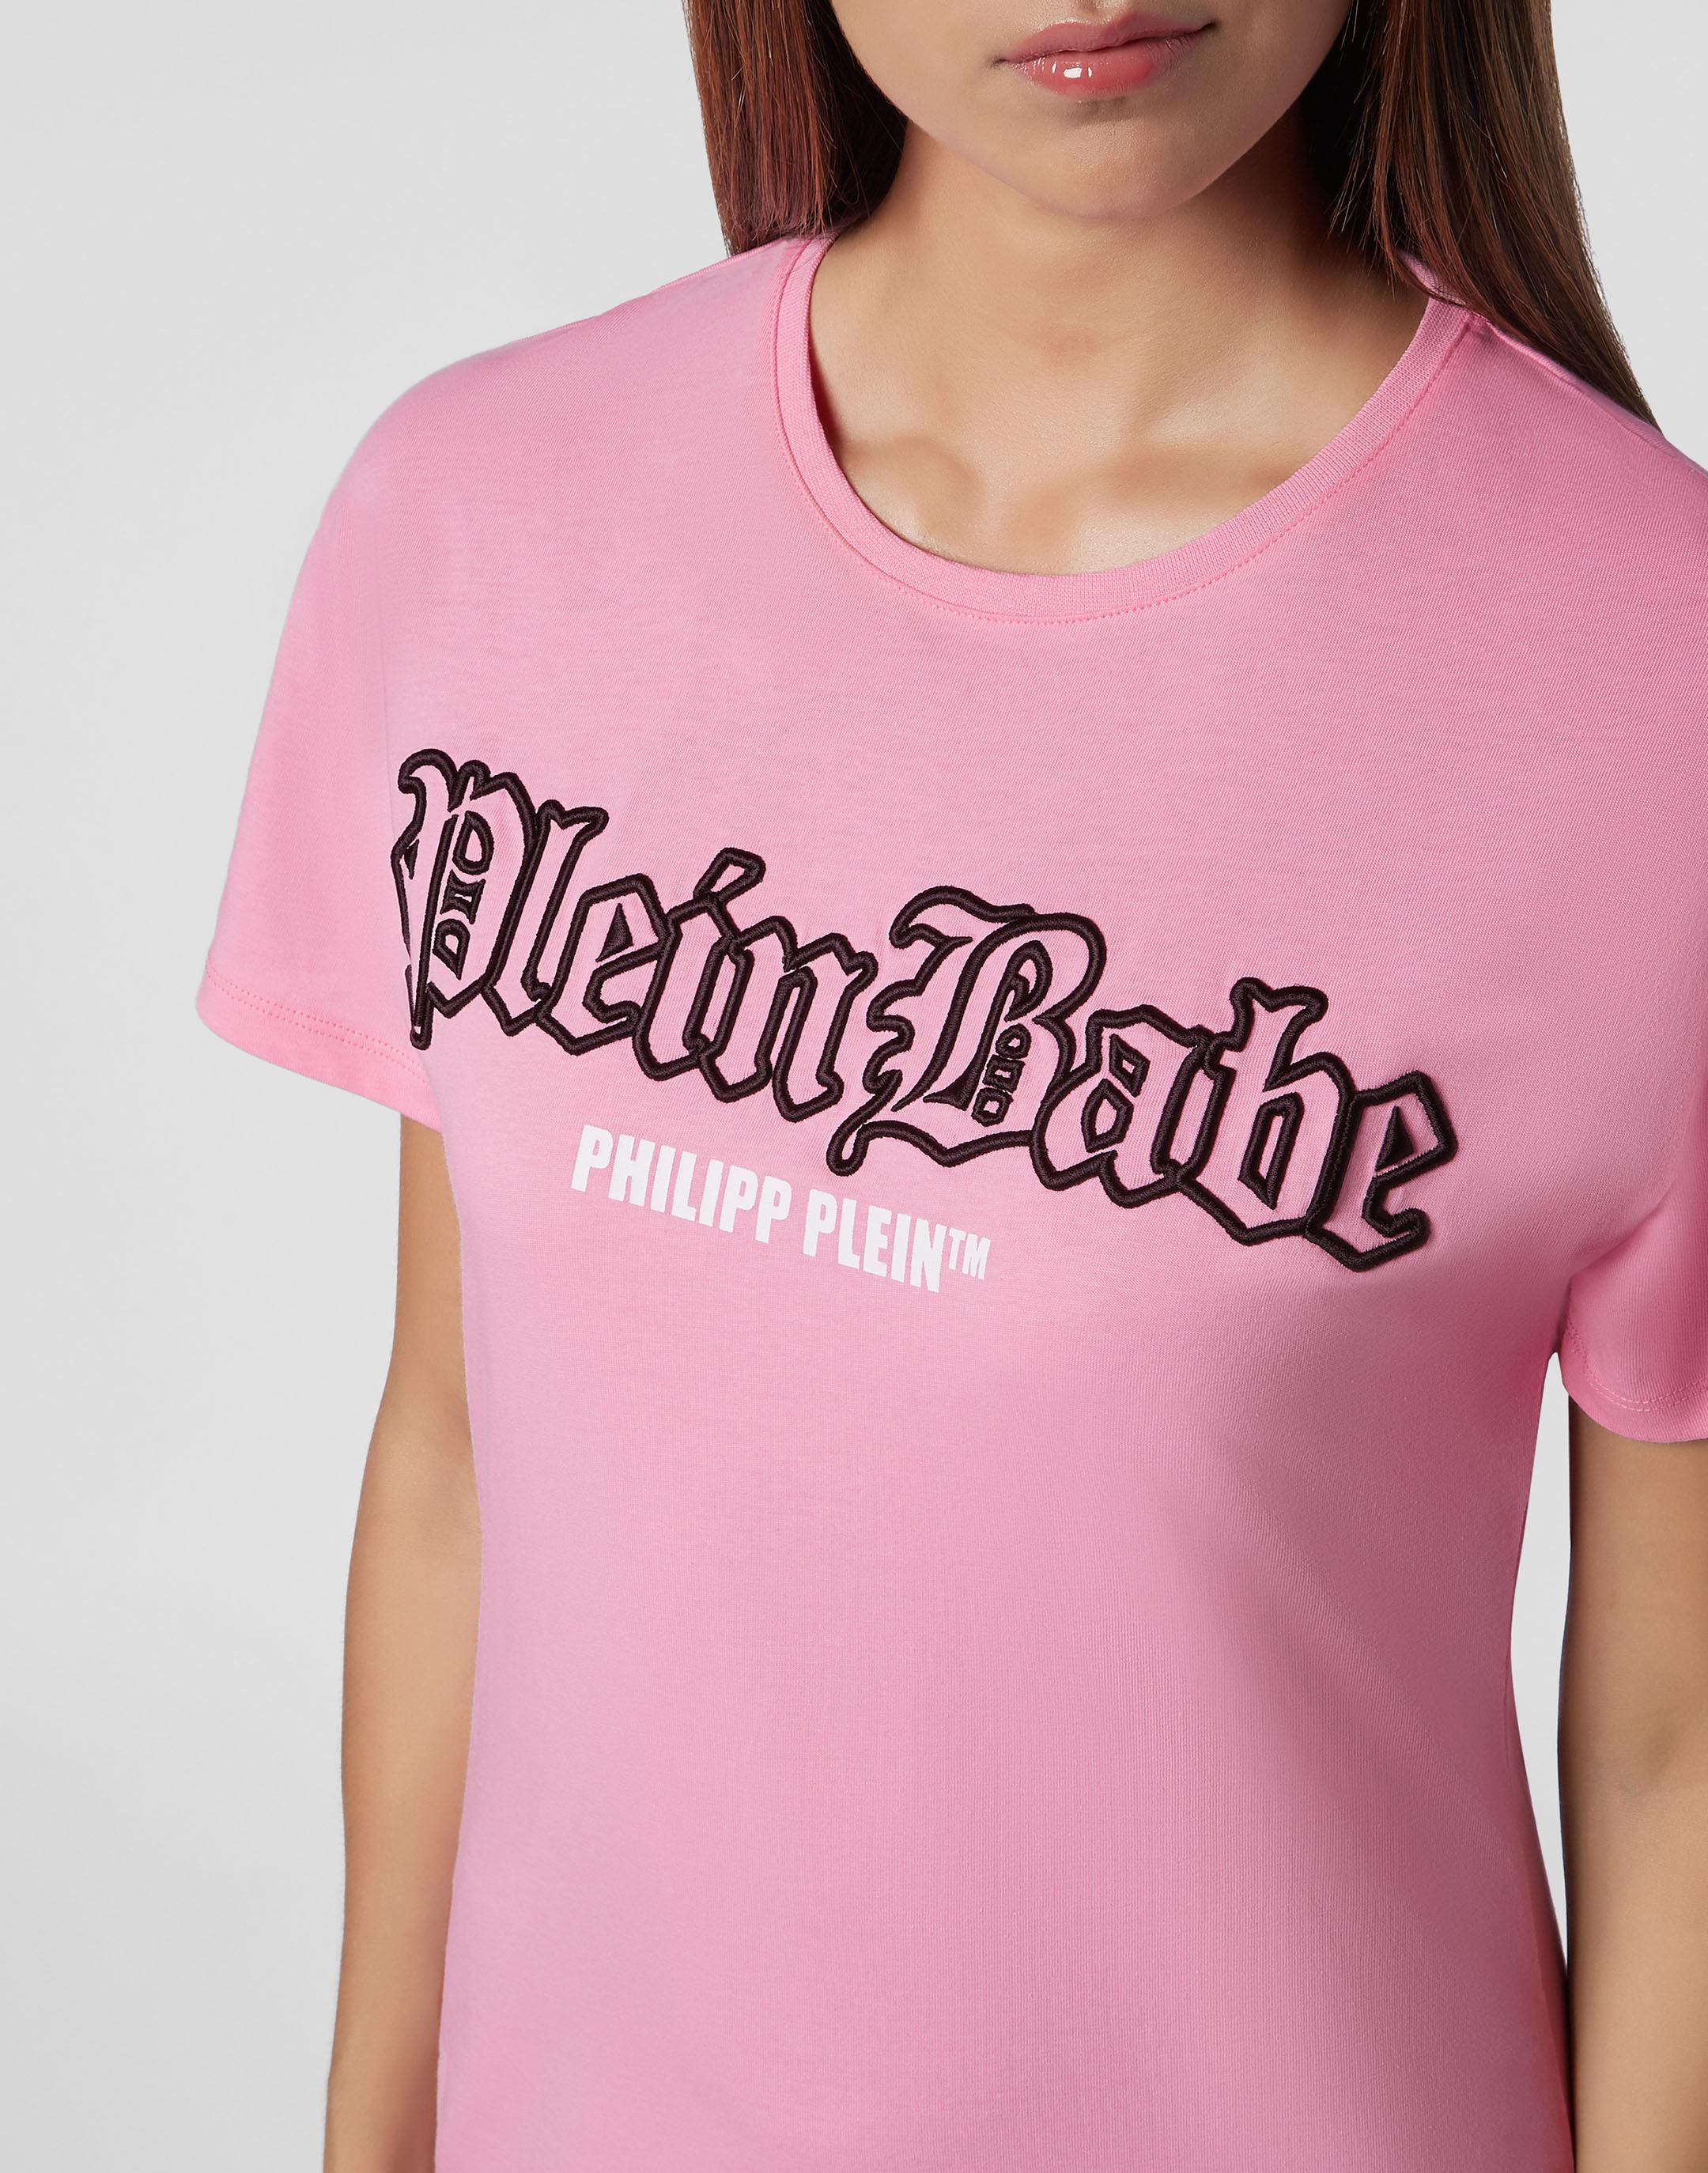 PUTIEN Scenery Decor Girls Short-Sleeve Midweight T-Shirt,Polyester,Caribbean Island Ov